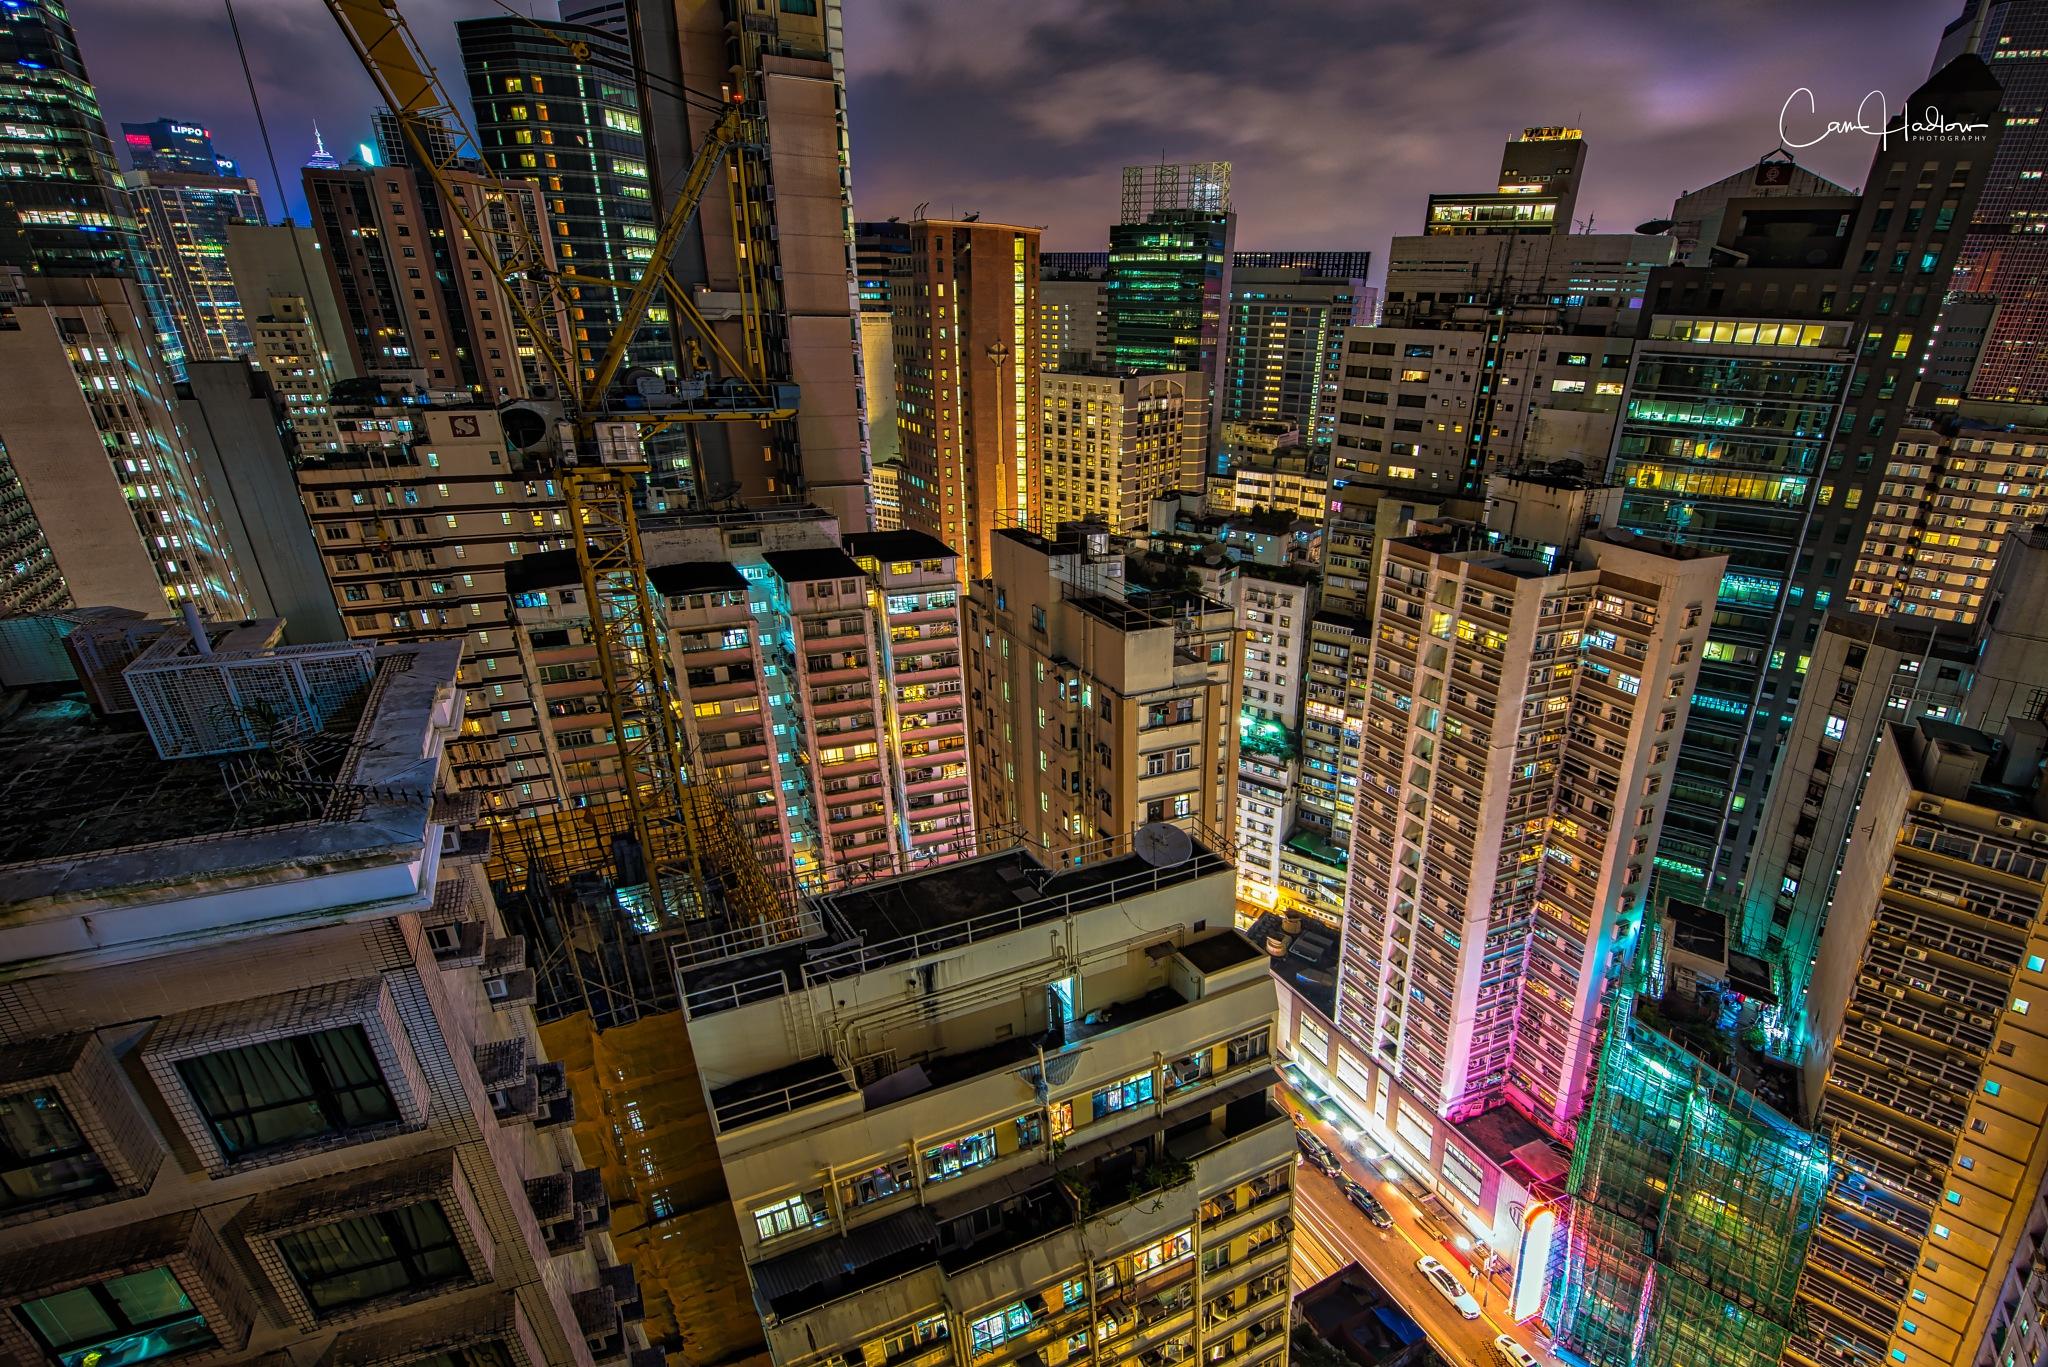 High above Wanchai by CamHadlowPhotography